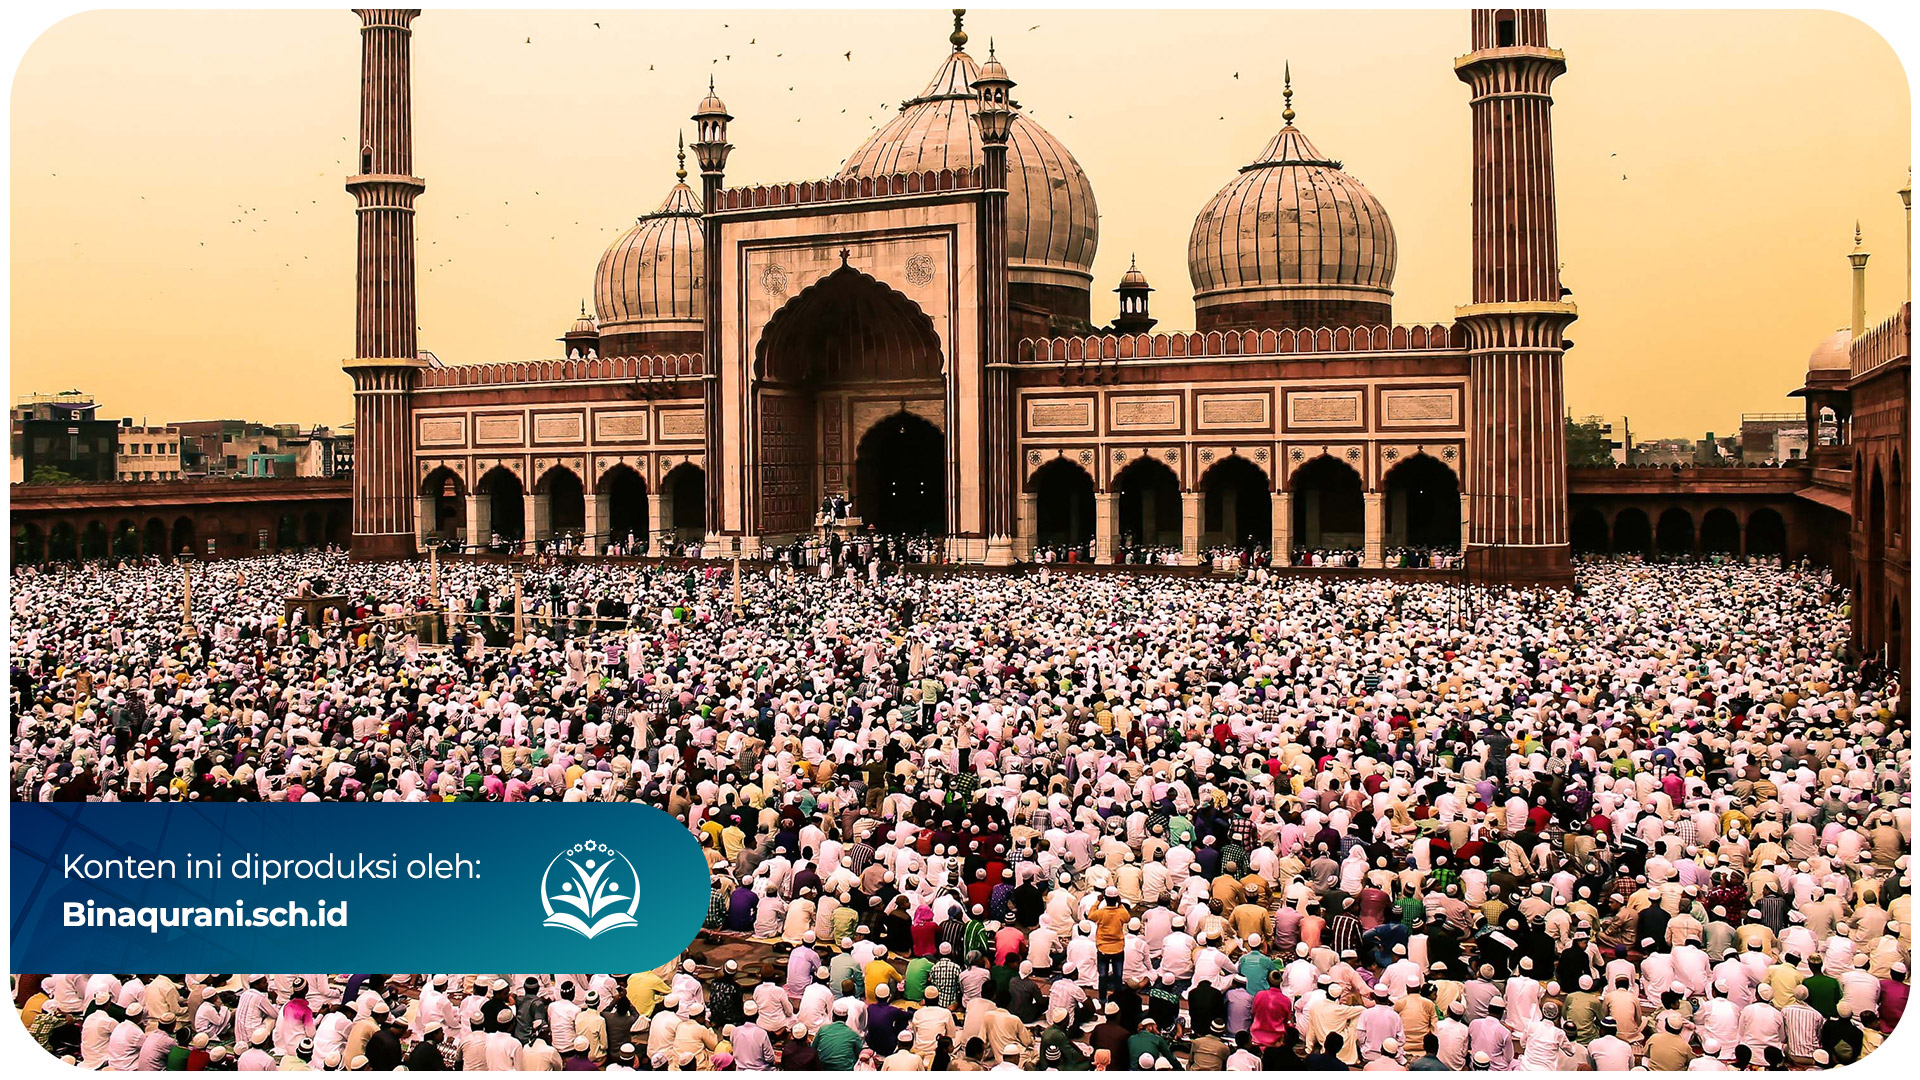 Bina-Qurani-Warga-Negara-Adalah